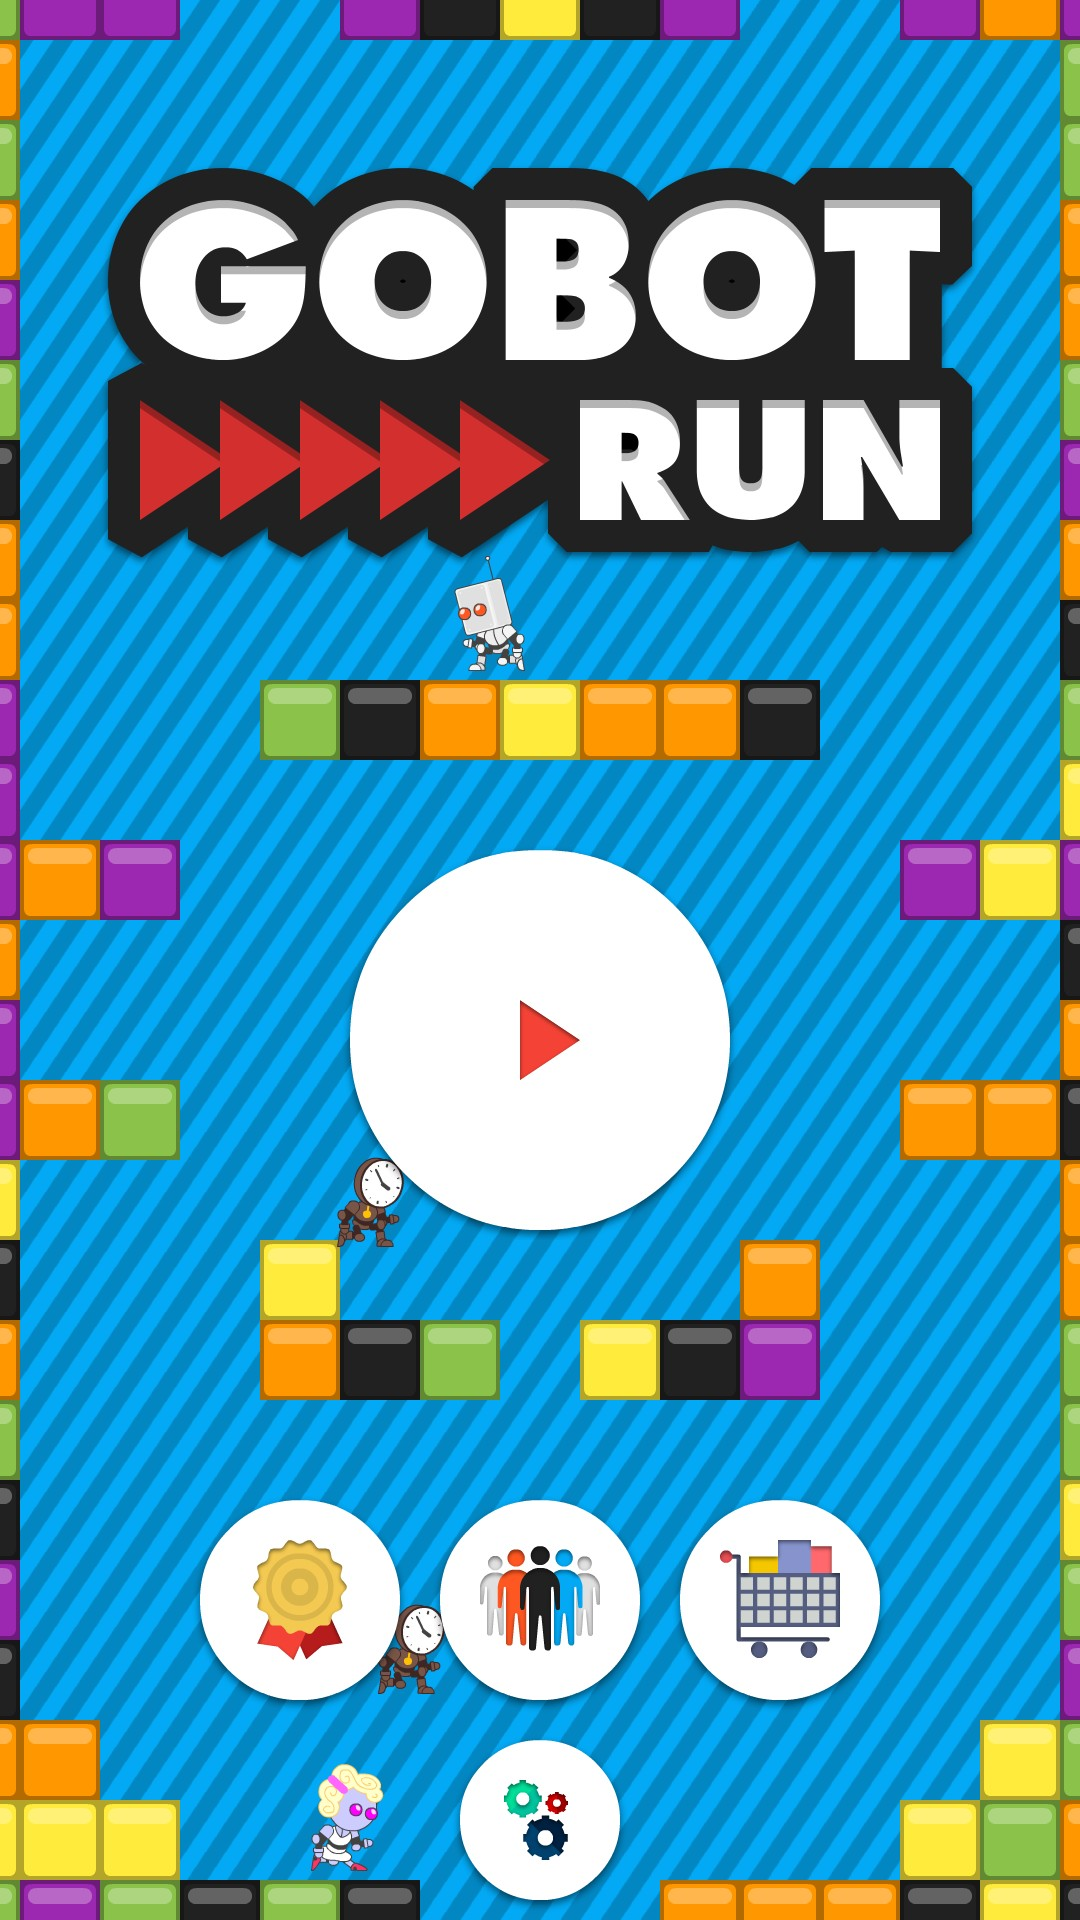 Gobot Run